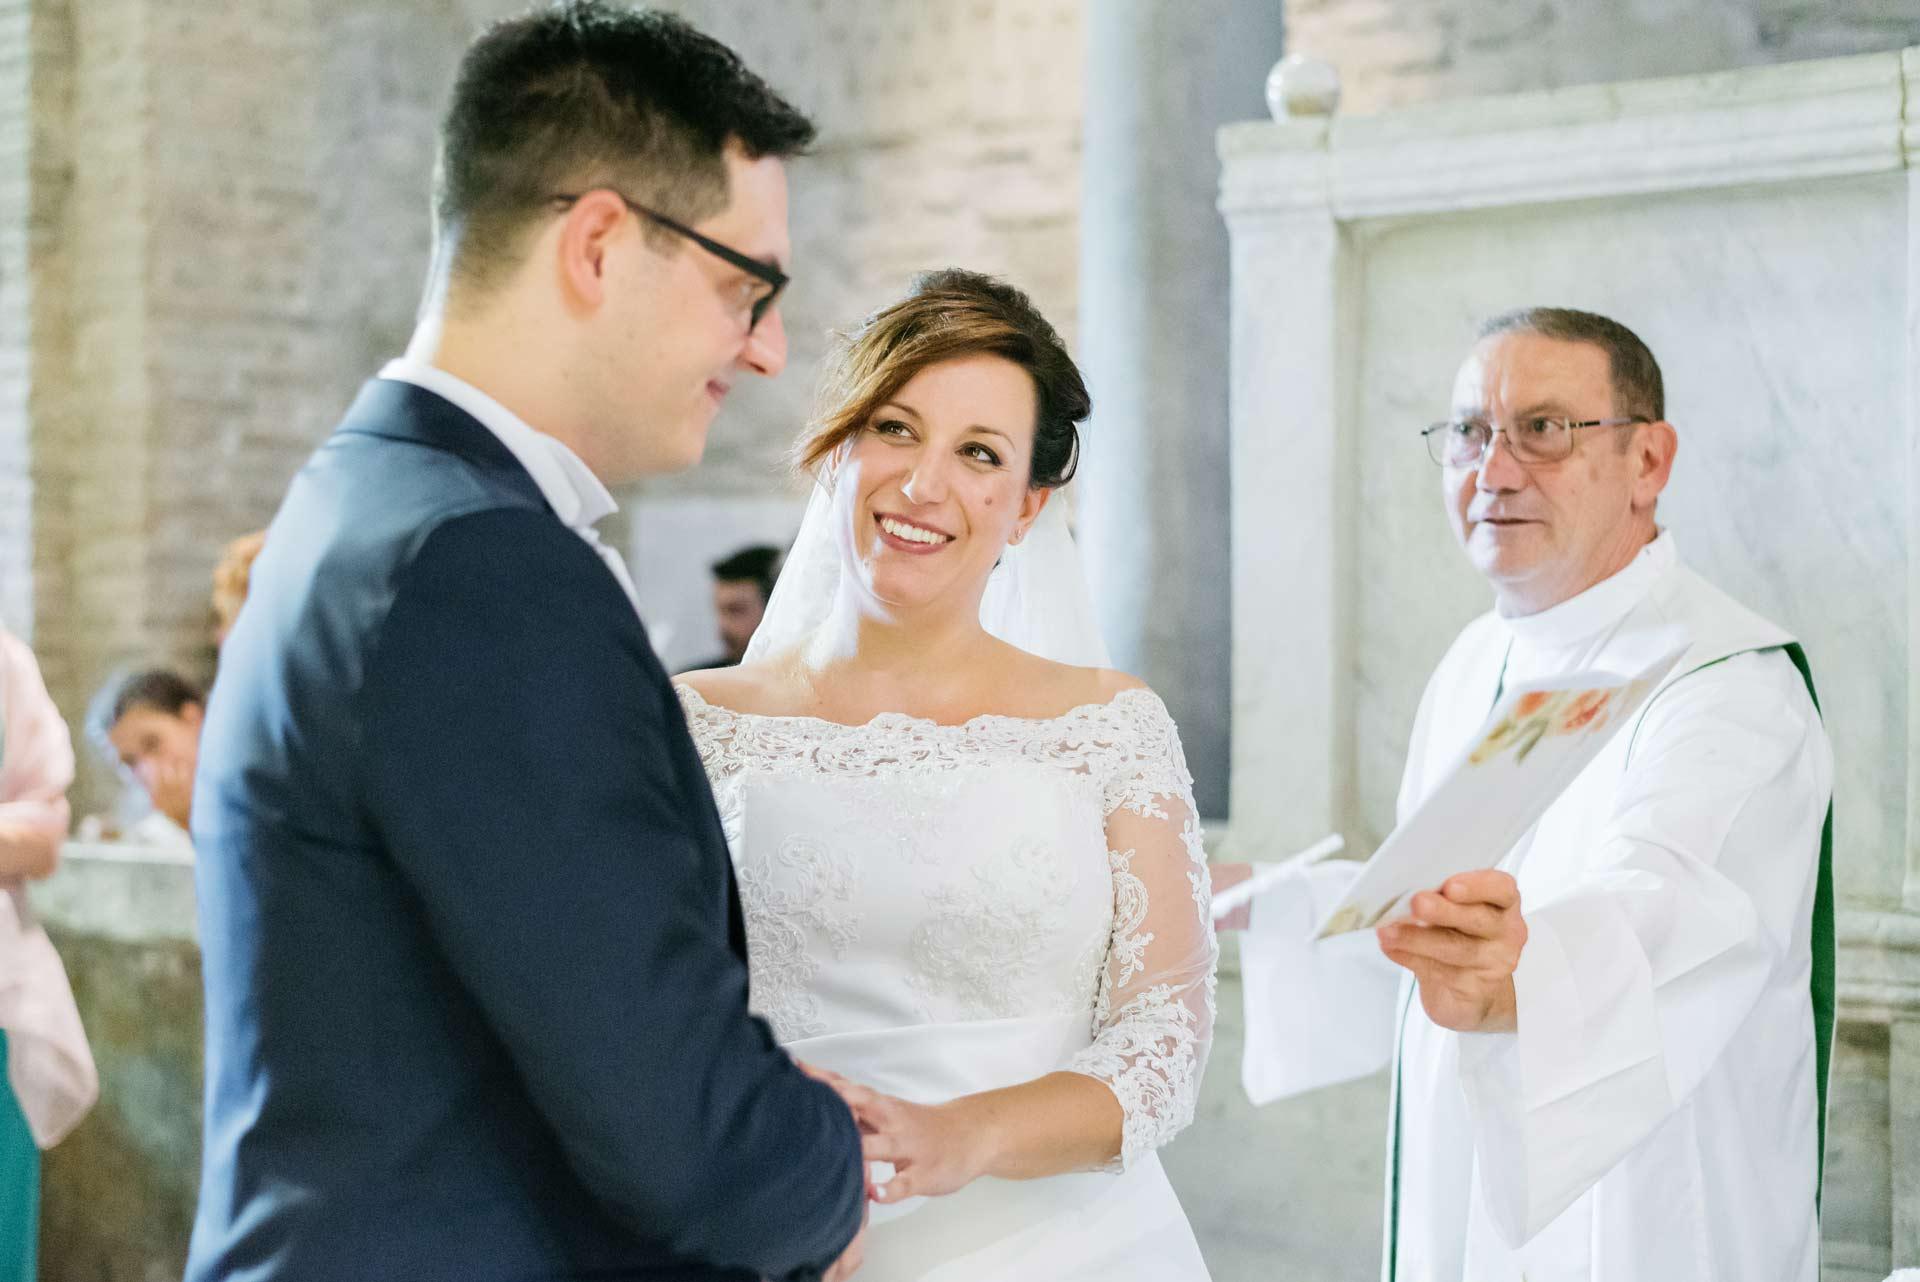 fotografo-matrimonio-roma-s&g-sant'antimo-simone-nunzi